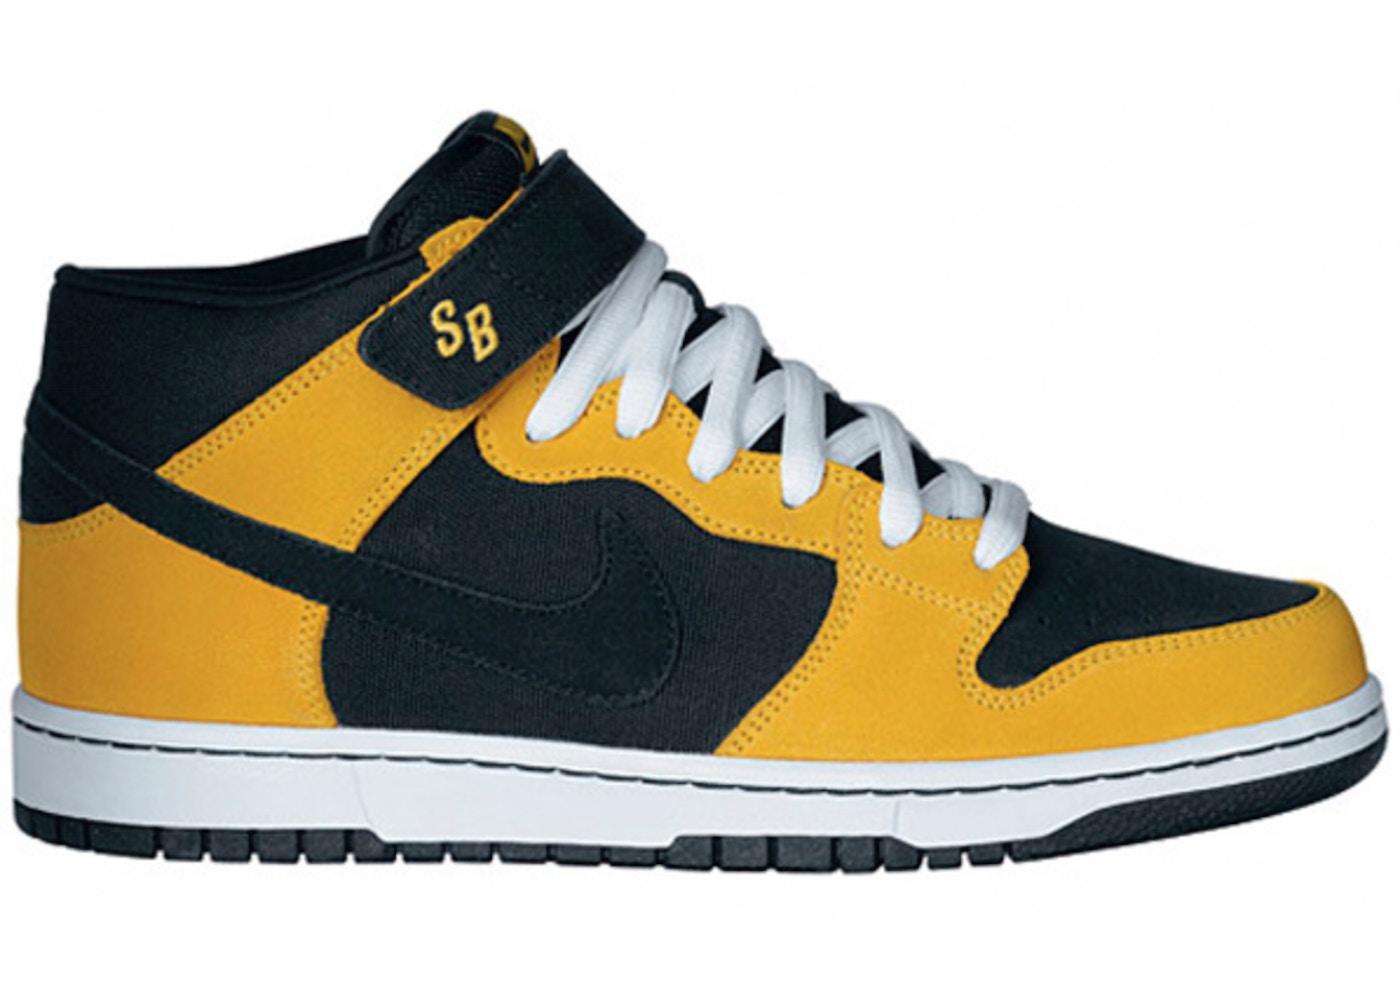 newest f9cea 6b000 Nike Dunk SB Mid Wu-Tang